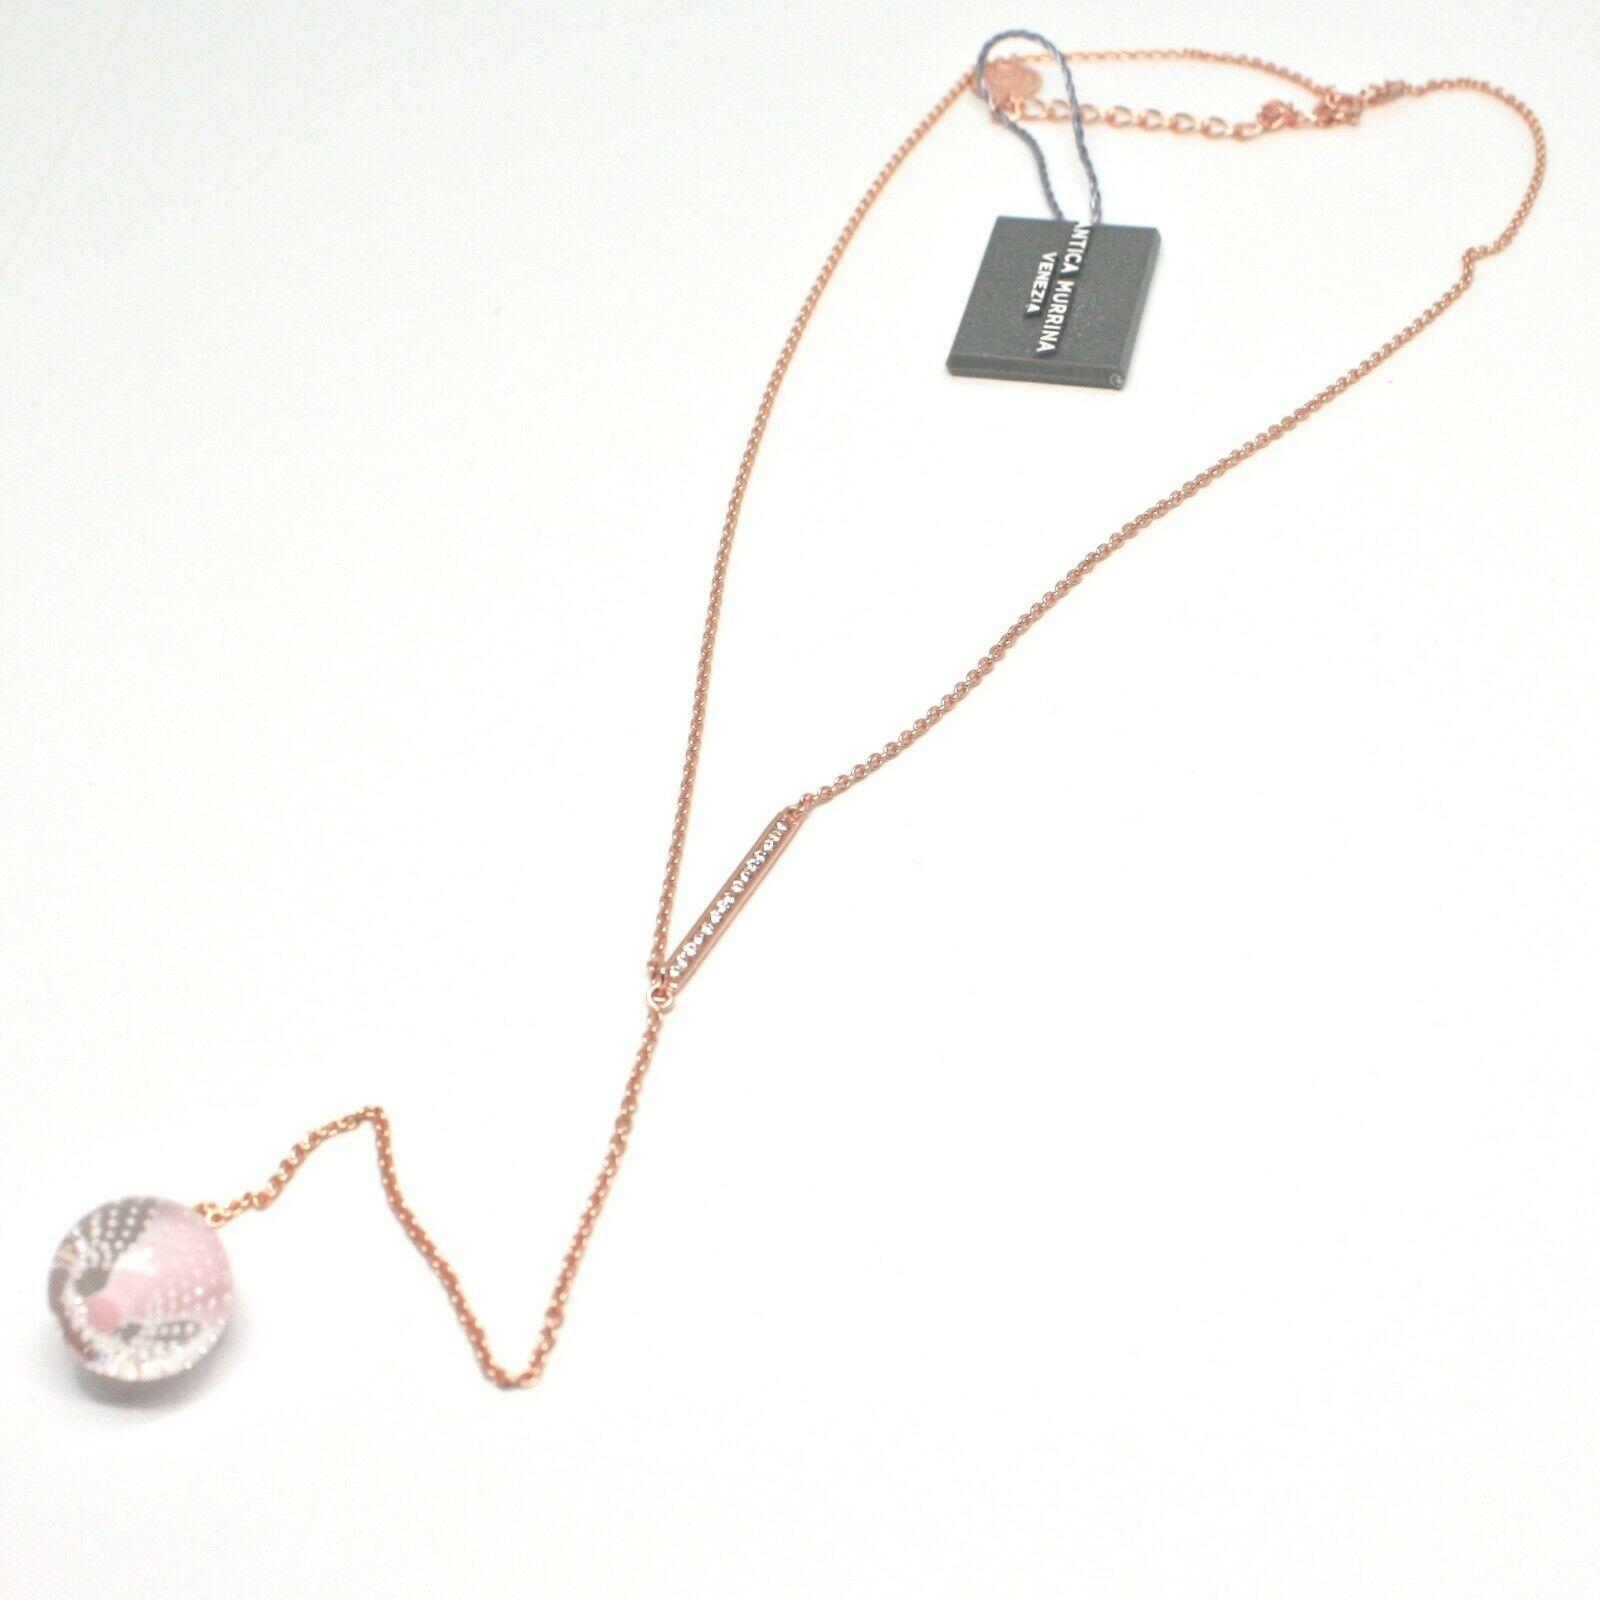 Collar Antica Murrina Venezia de Plata 925 con Cristal de Murano AMVJWCP009C03 image 4